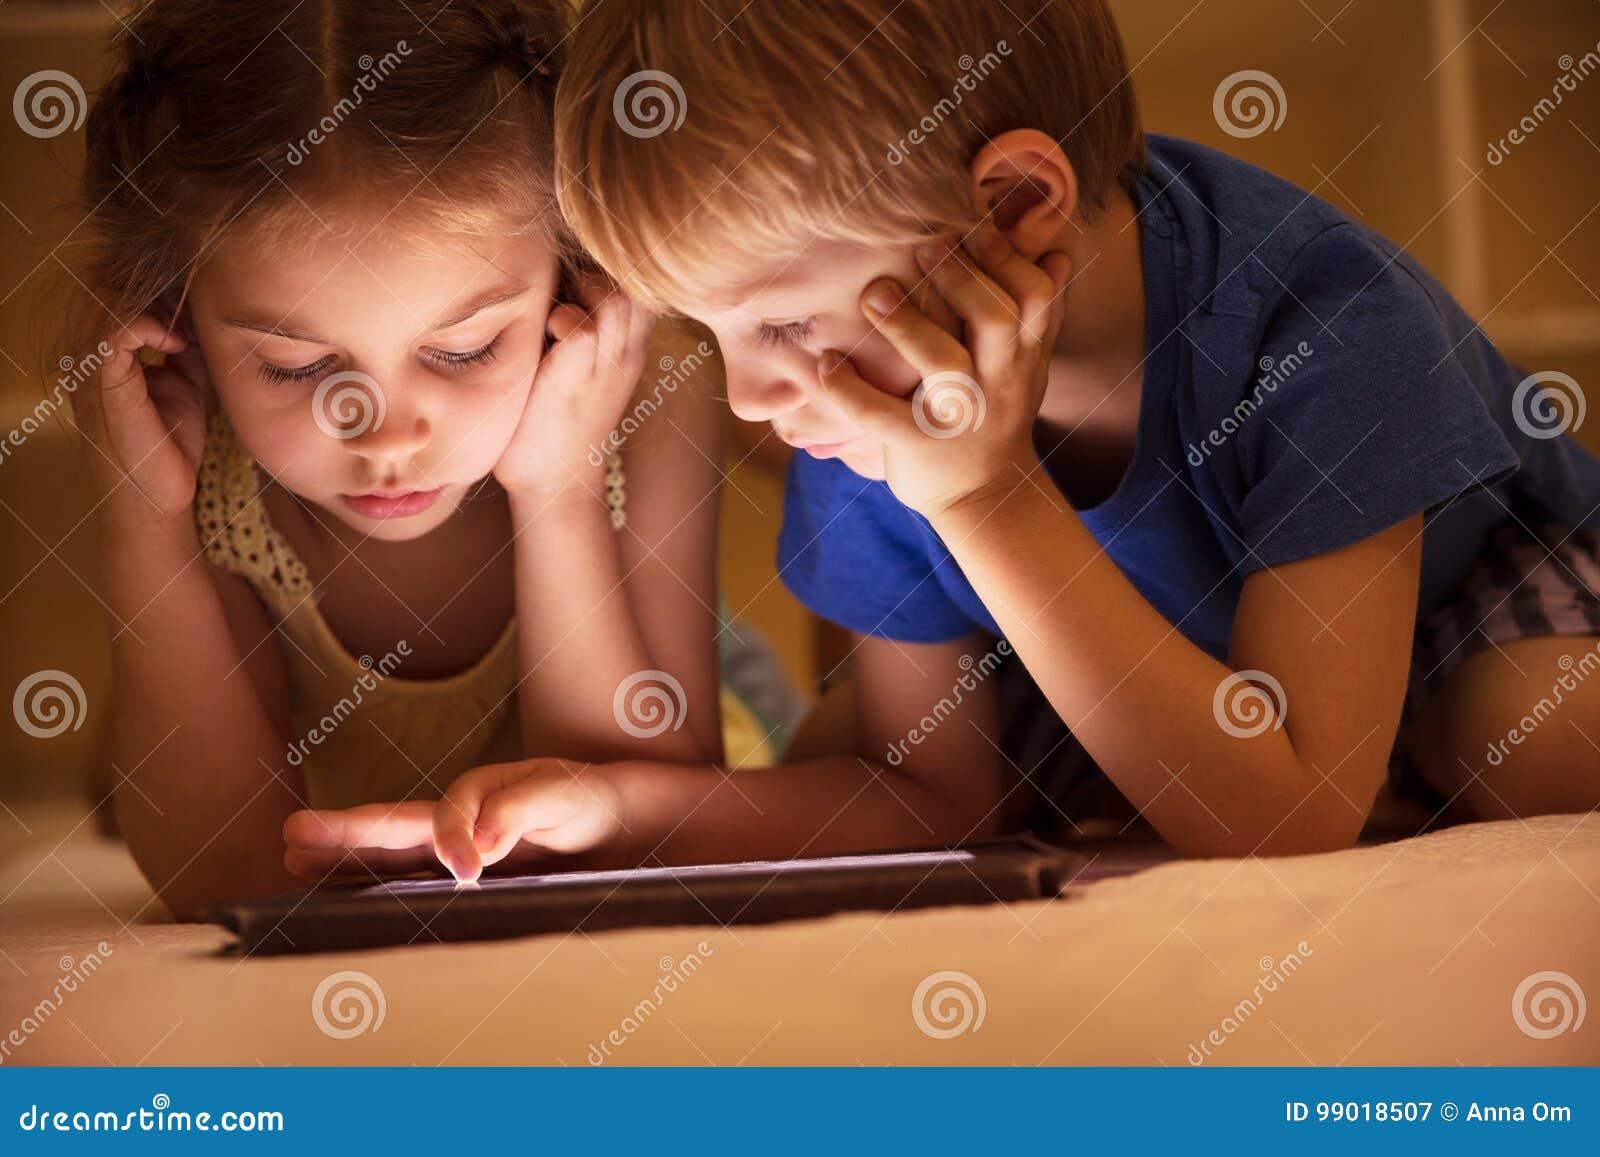 Two little kids watching cartoons